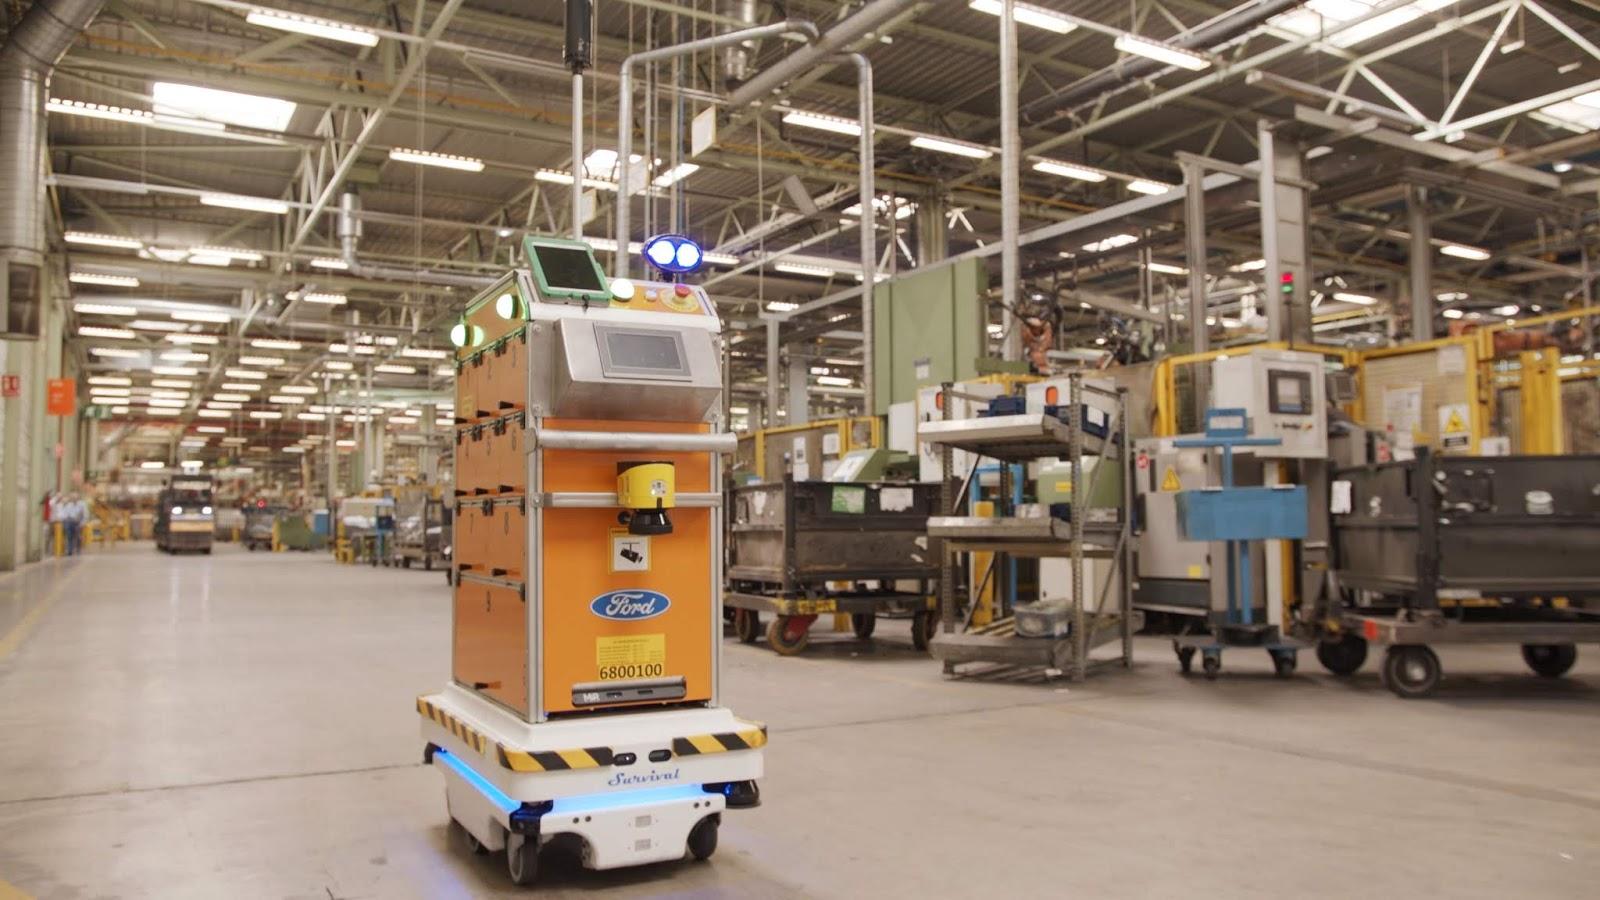 Ford SelfDrivingRobot 4 Η Ford έφτιαξε ένα ρομπότ για τις χαμαλοδουλειές του εργοστασίου της! Ford, video, videos, Εργοστάσιο, Τεχνολογία